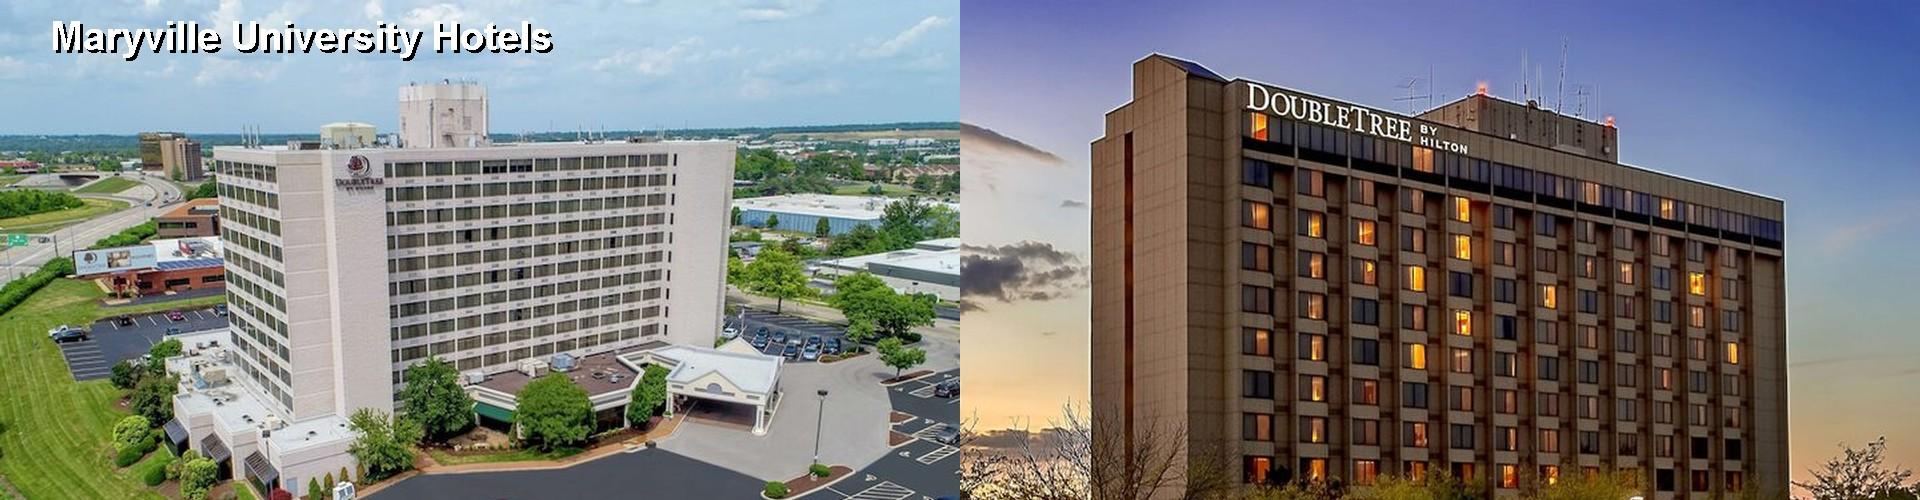 5 Best Hotels Near Maryville University